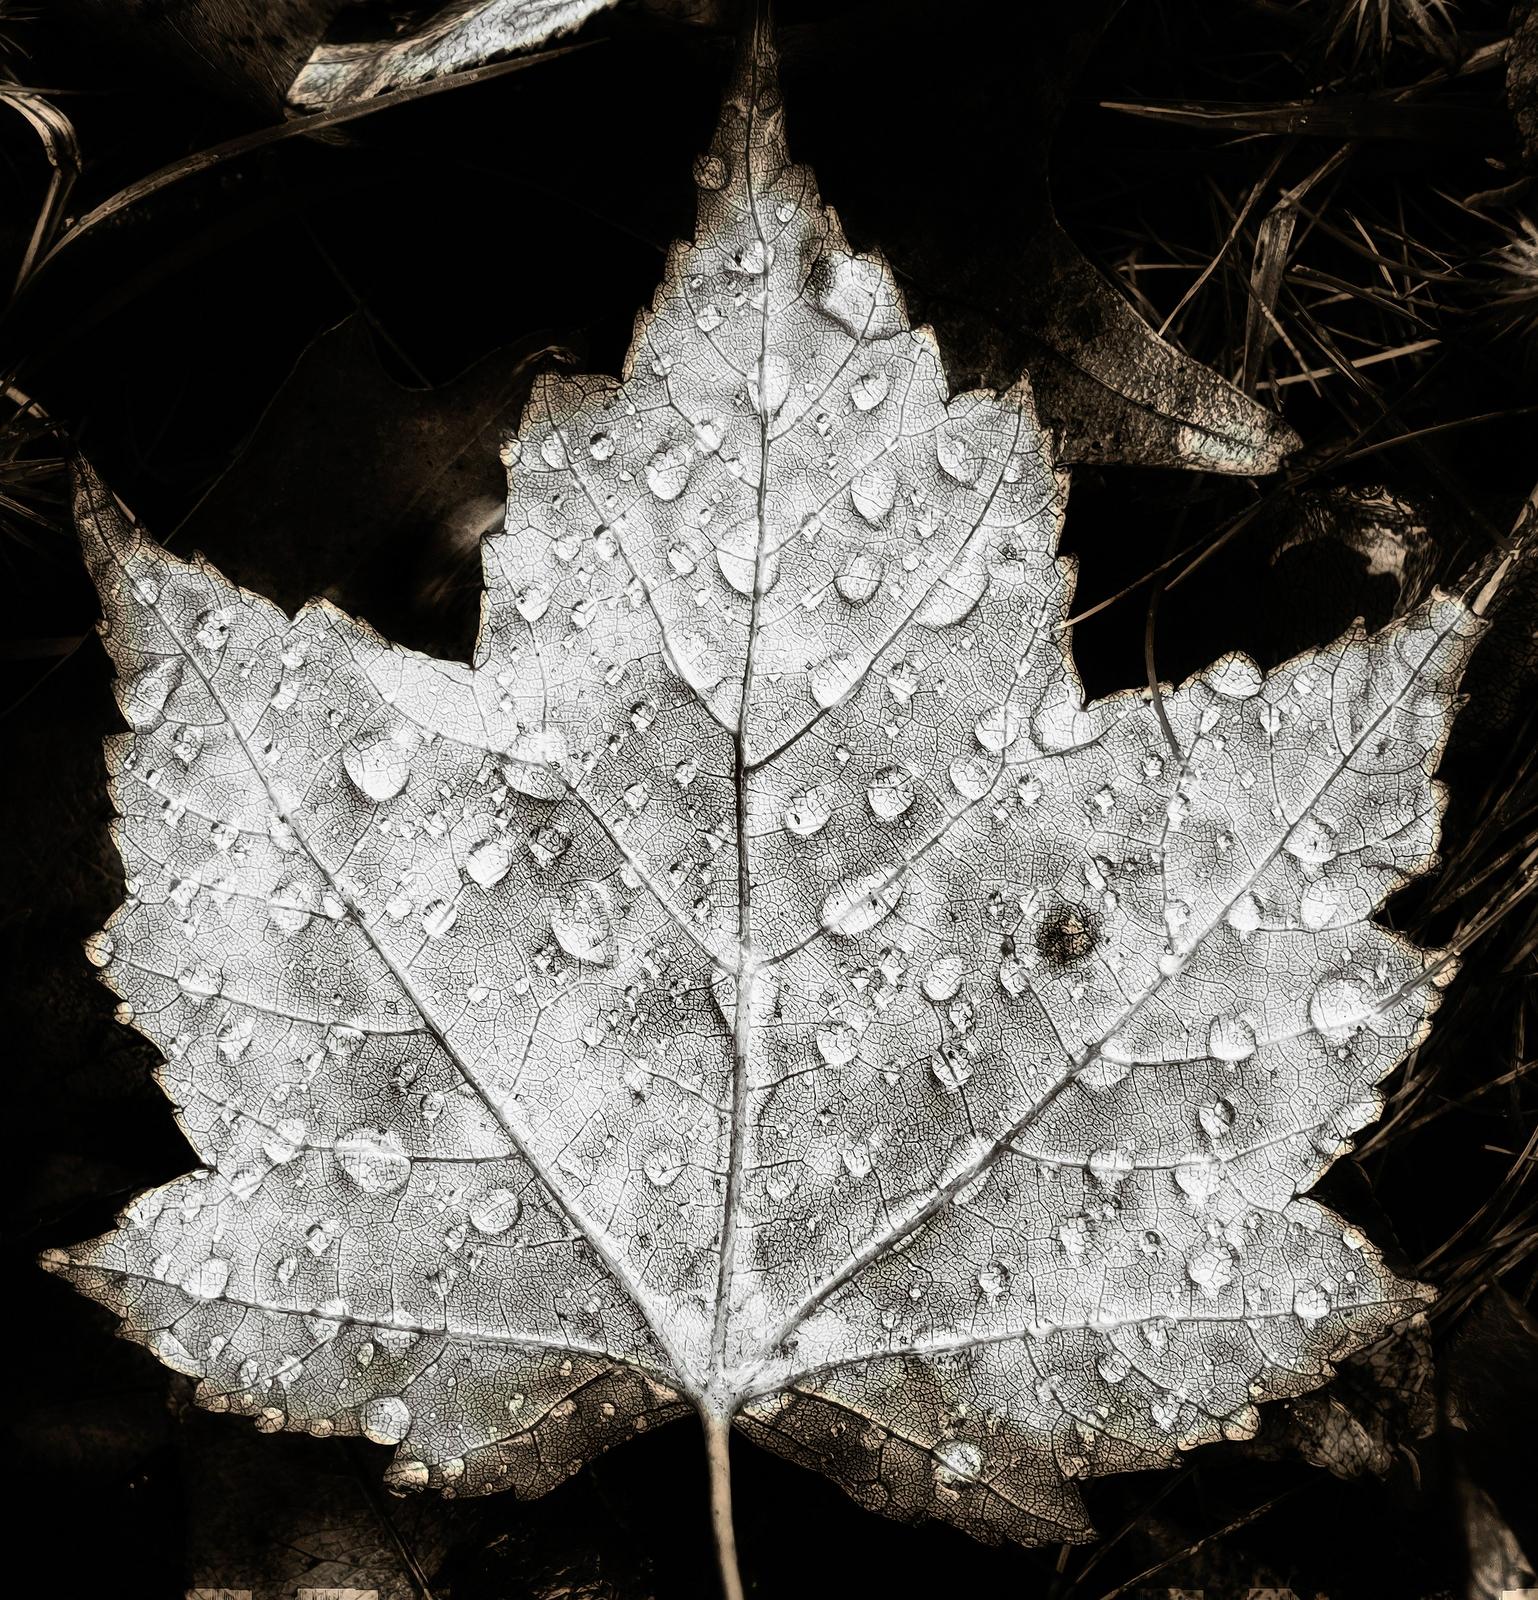 sinister maple leaf  - monochrome - docdenny   ello